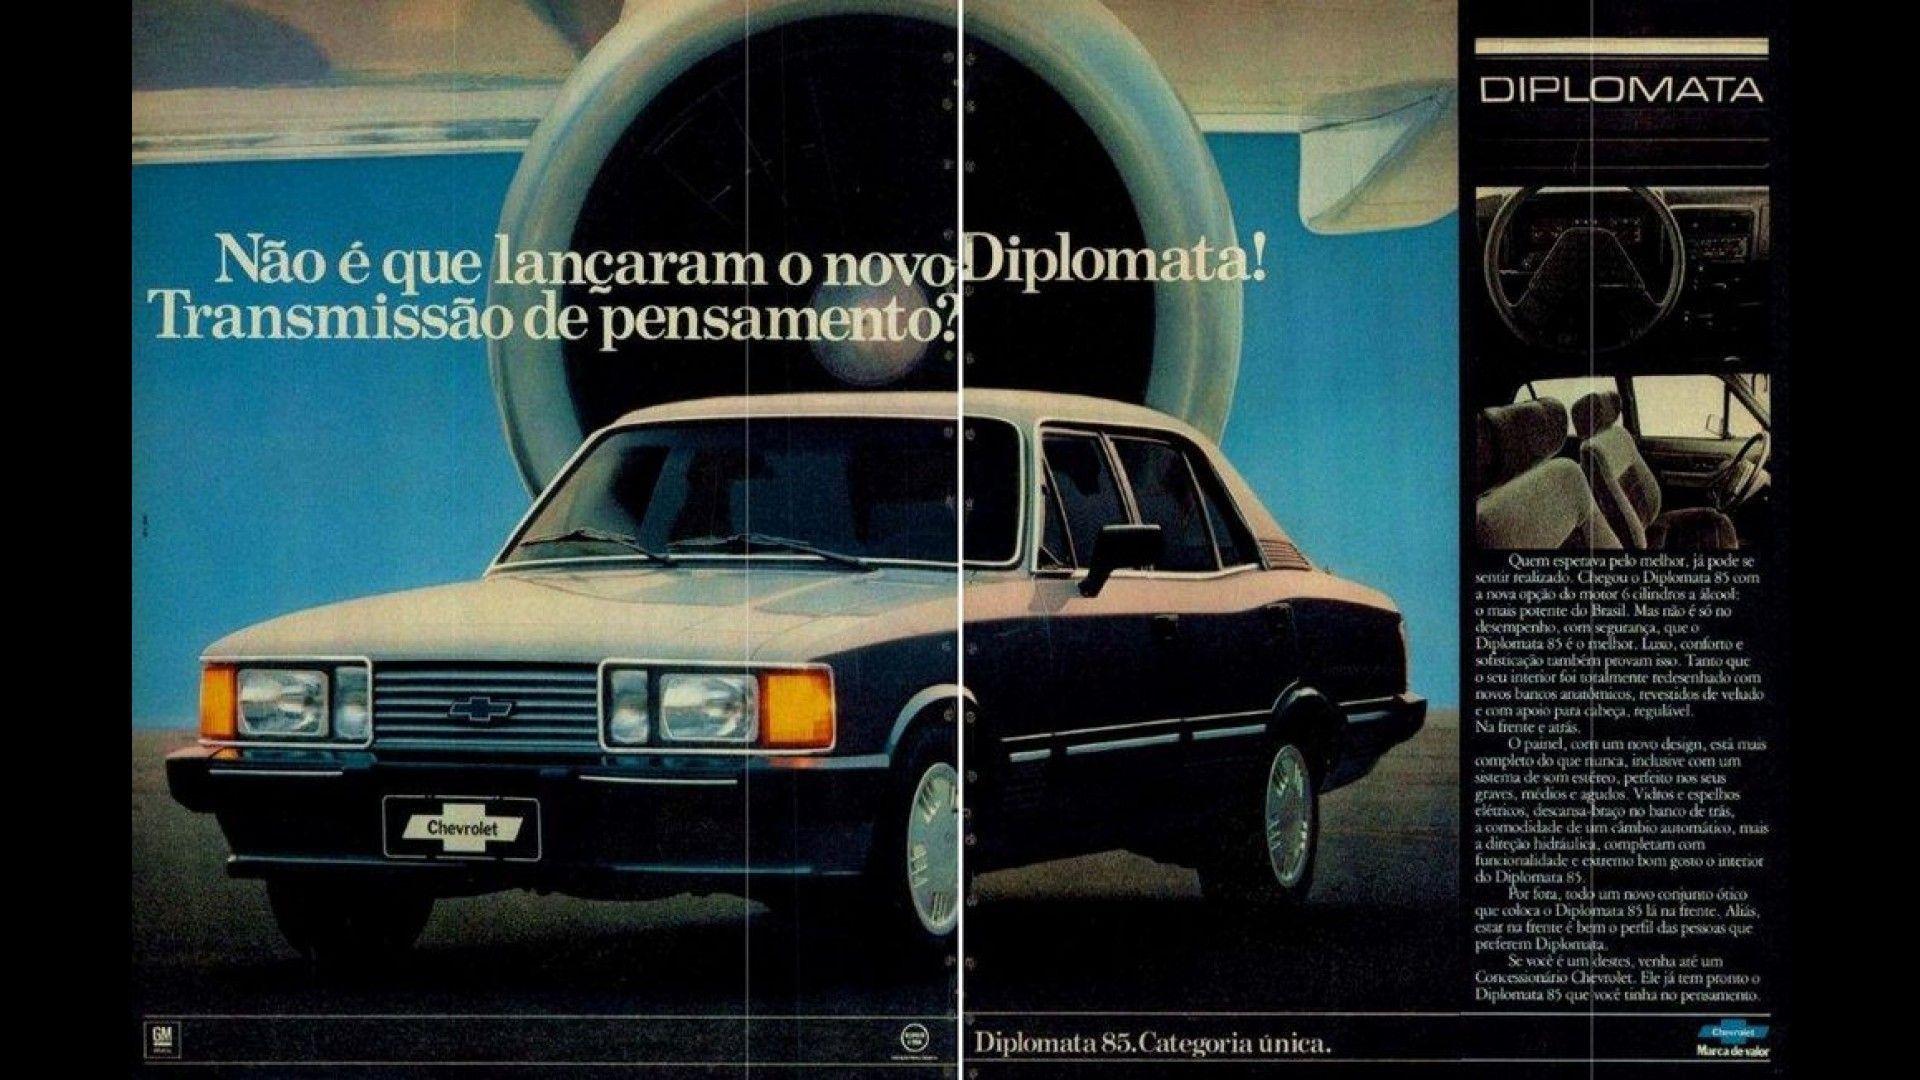 carros-para-sempre-prestigiado-opala-diplomata-reinou-nos-anos-1980